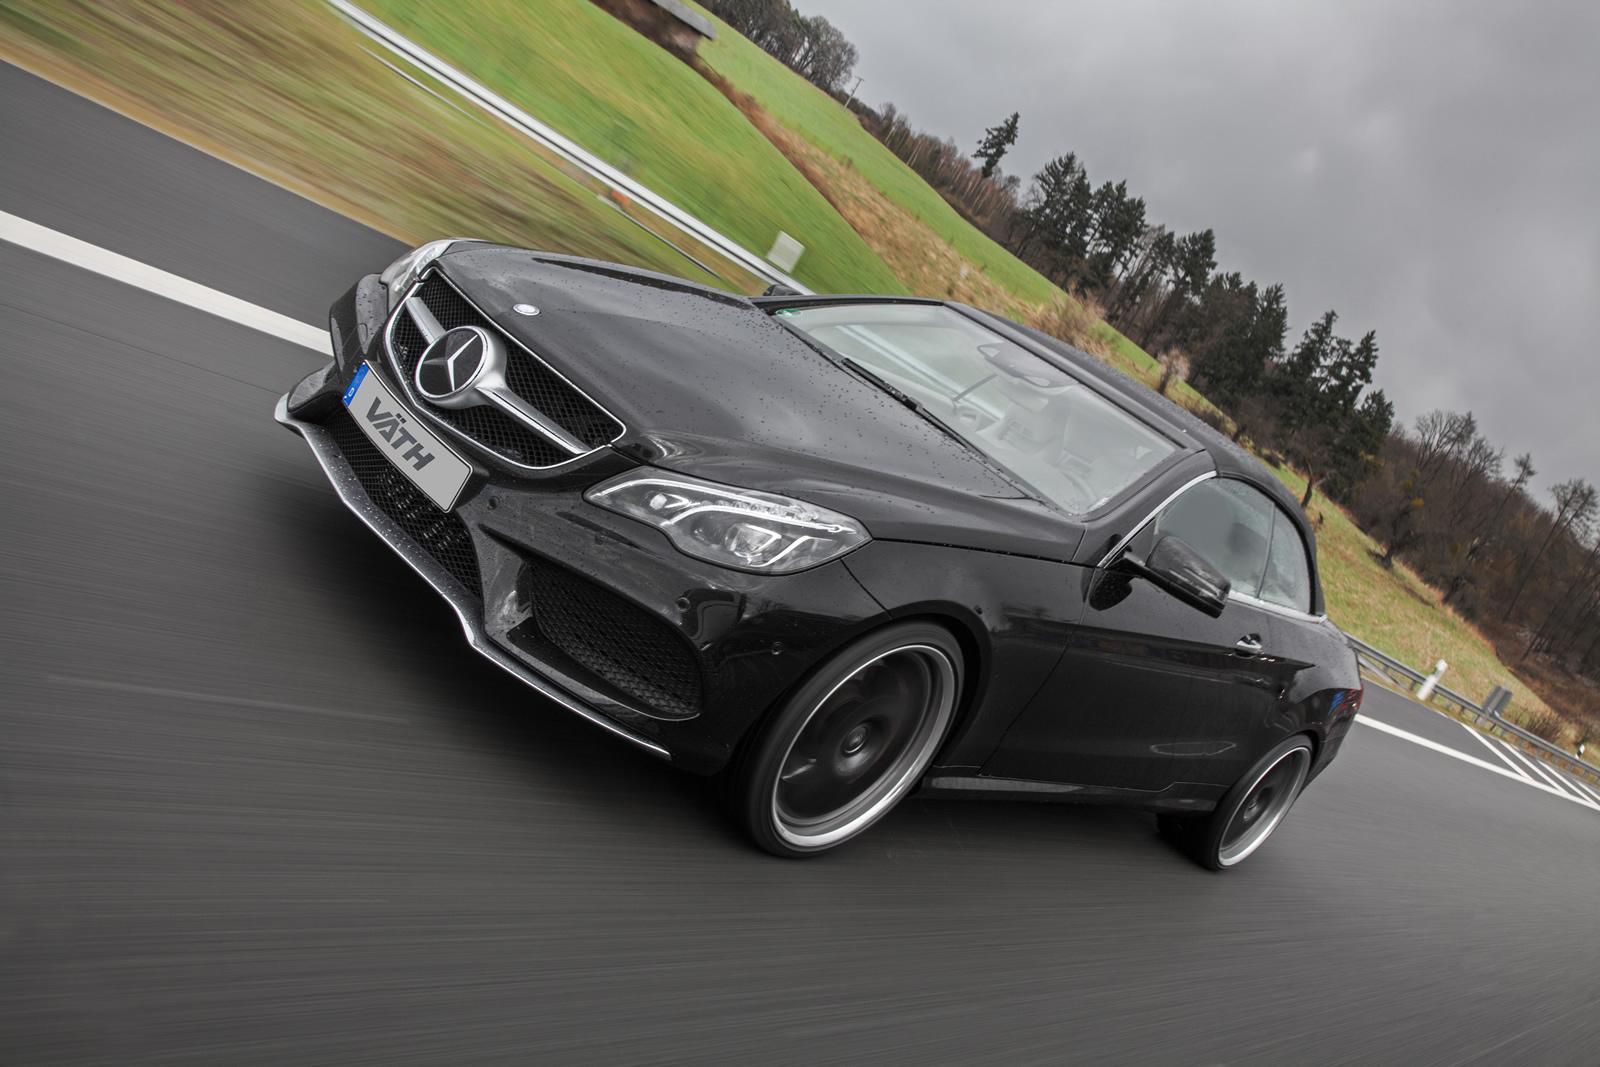 mercedes benz e500 cabriolet receives 550 hp from vath. Black Bedroom Furniture Sets. Home Design Ideas